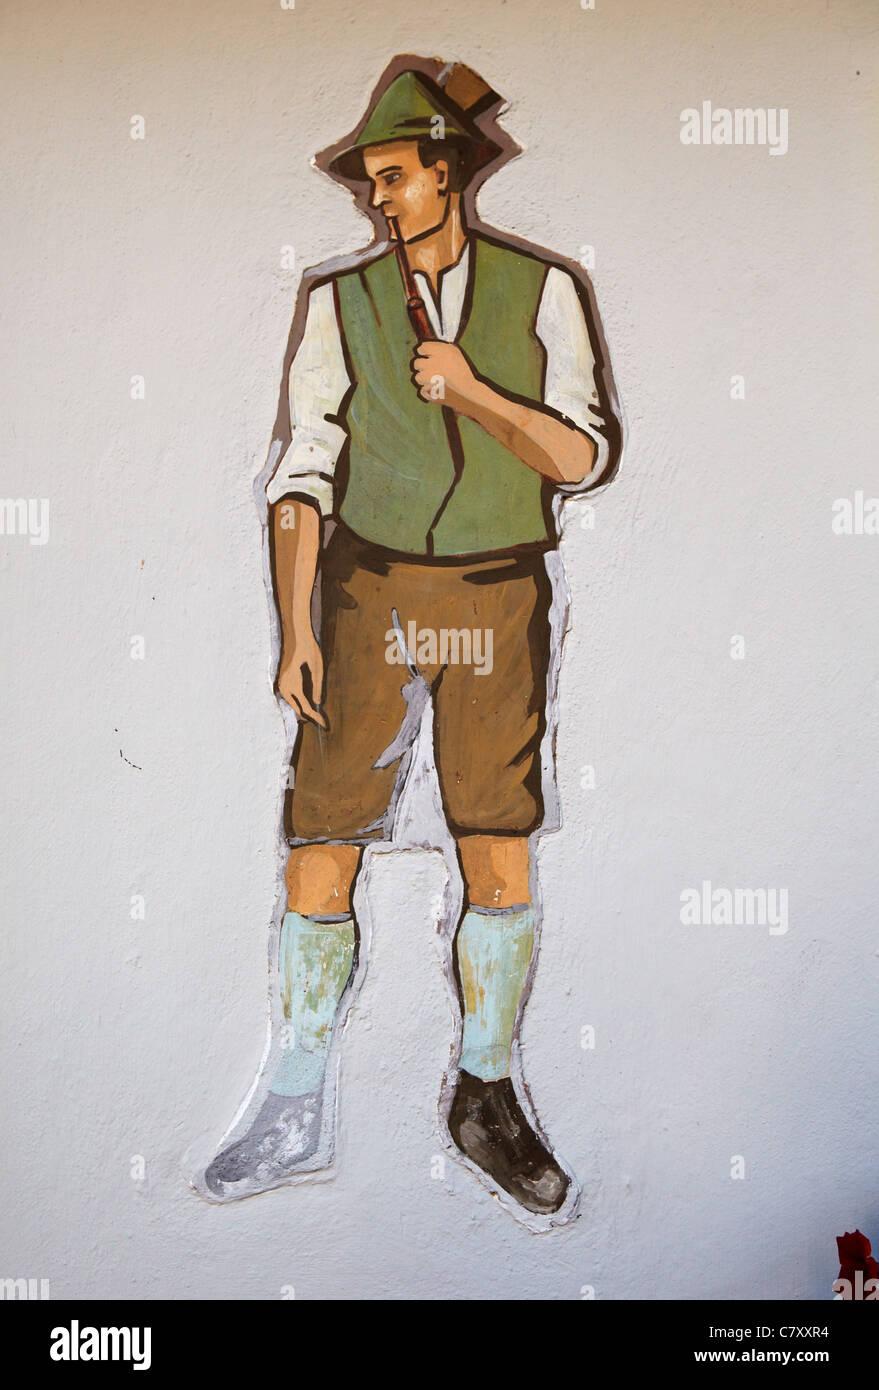 painting of Austrian man in Lederhosen - Stock Image